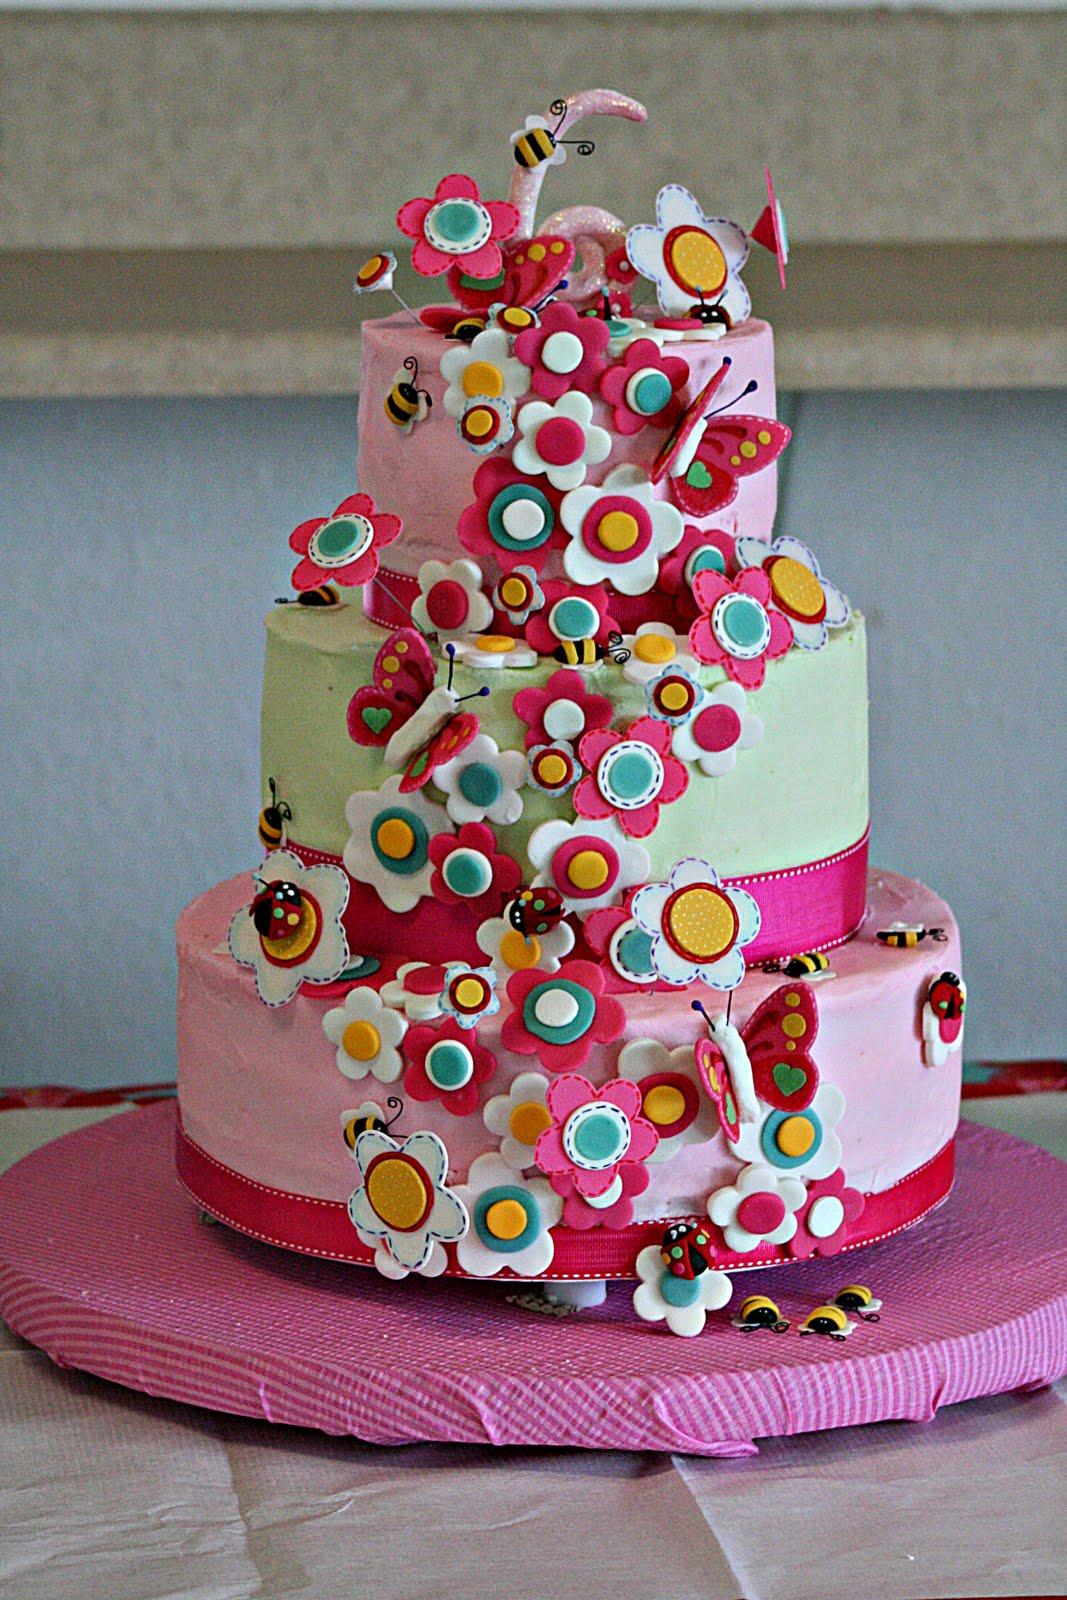 Serendipity Custom Cakes Miss Maiyah S Birthday Cake 2010